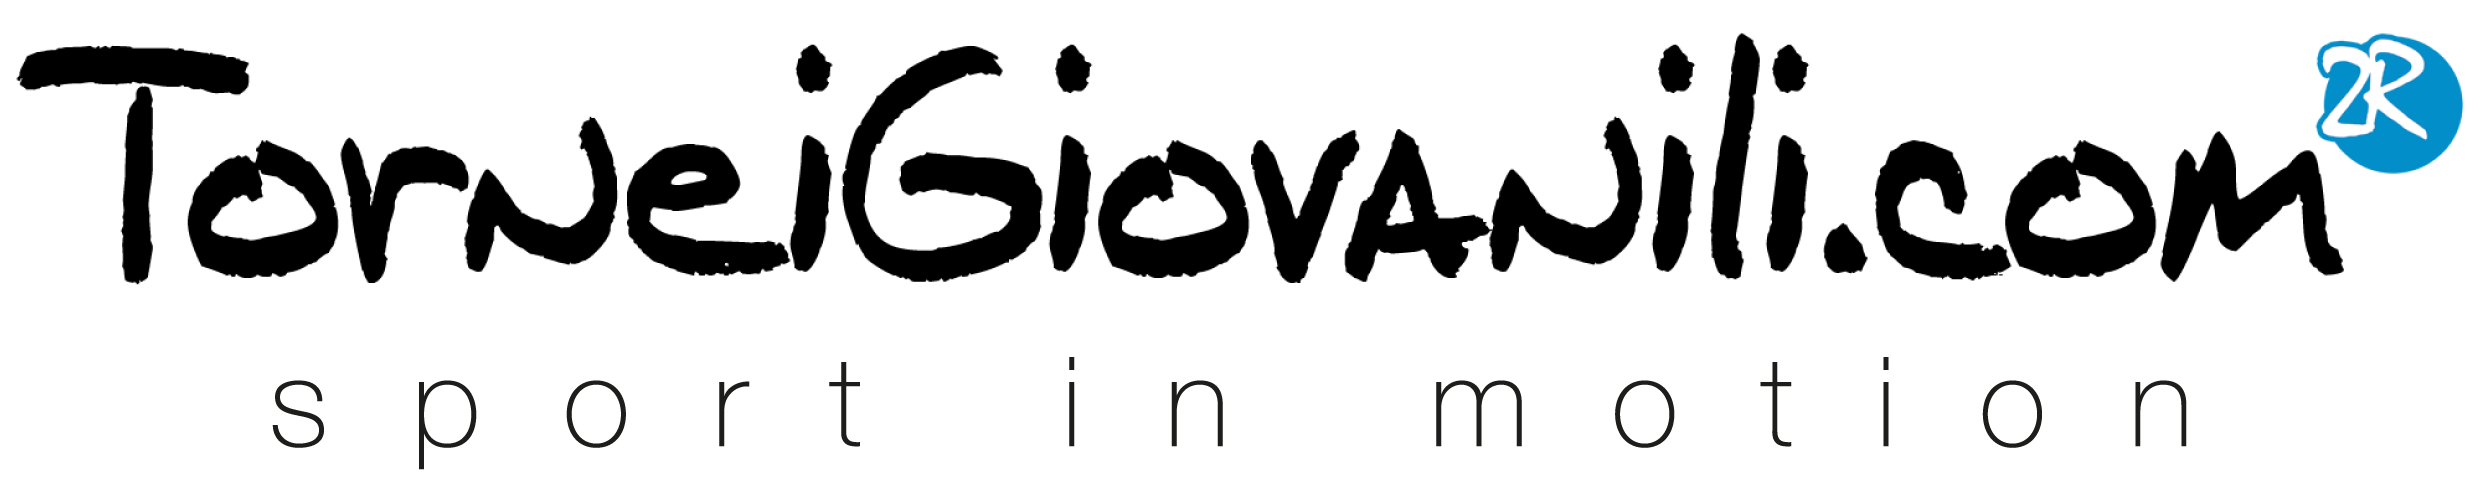 torneigiovanili.com